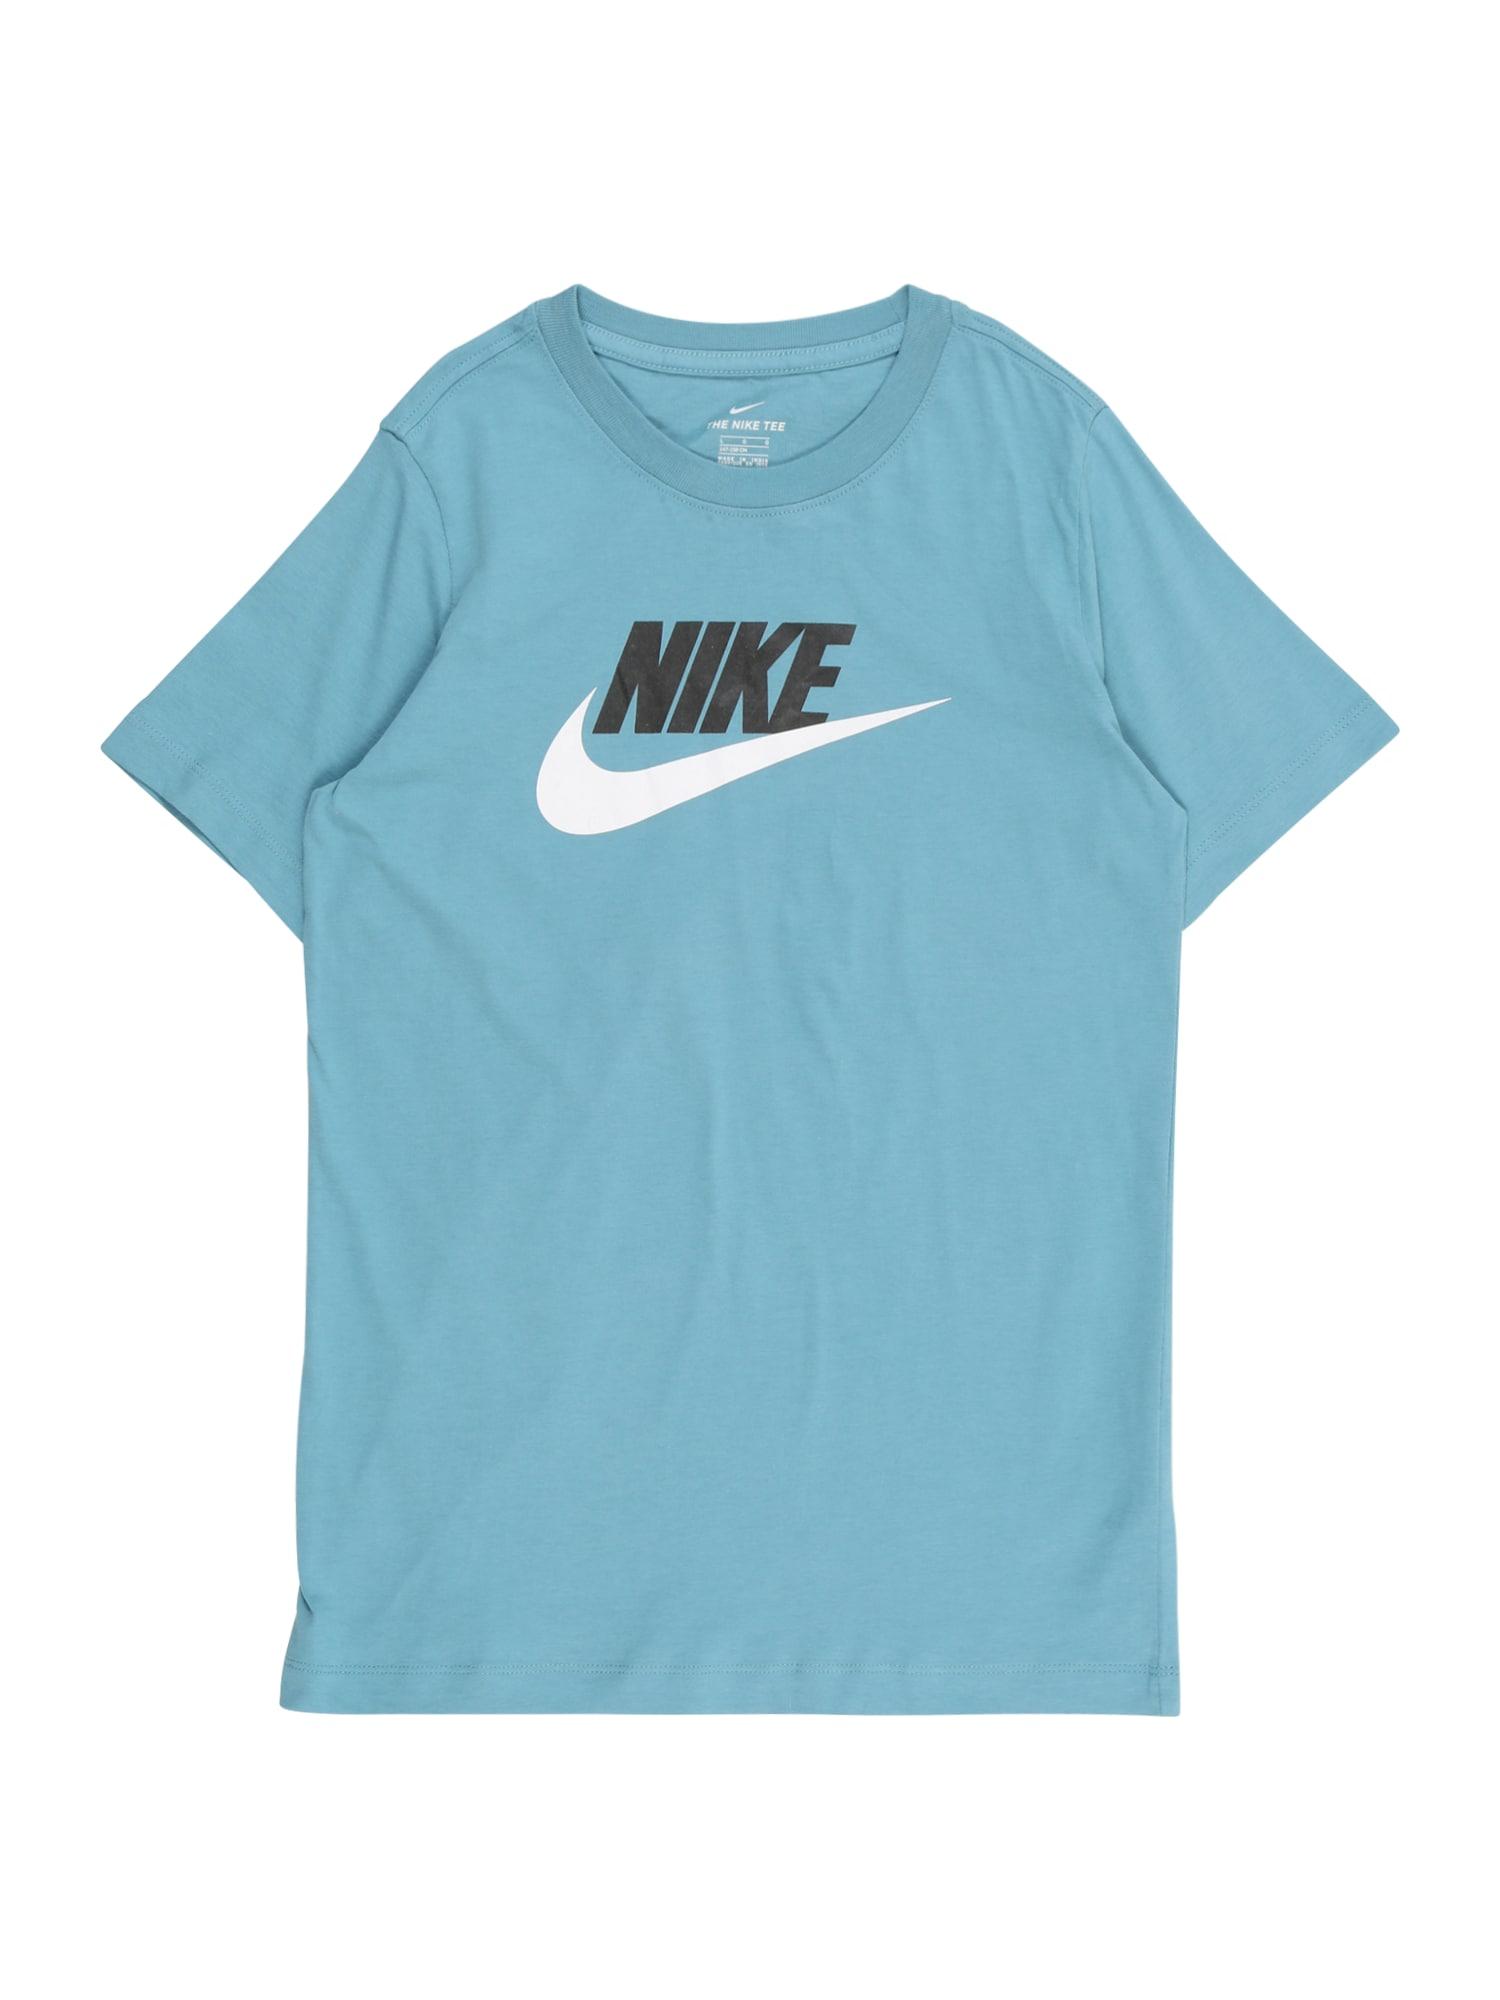 Nike Sportswear Tričko  světlemodrá / černá / bílá